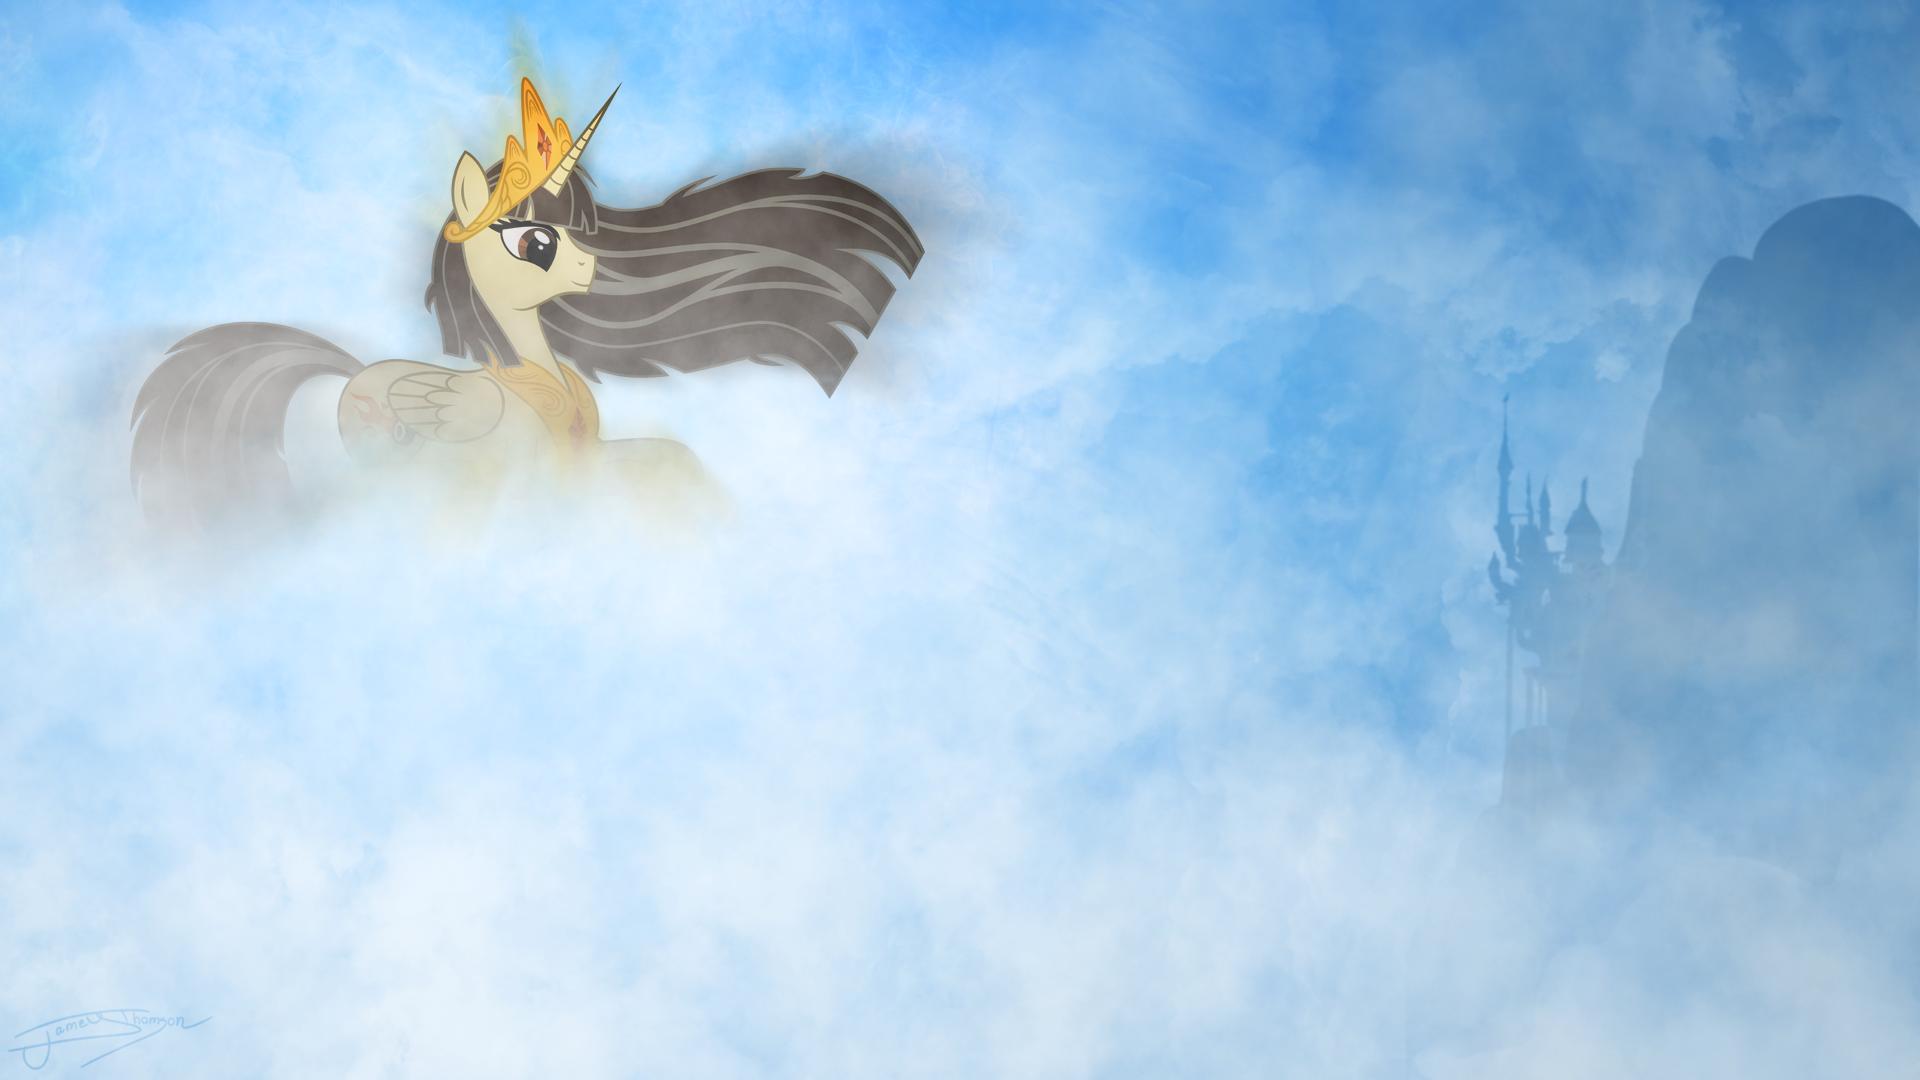 Princess Wildfire - Goddess of Equestria by Jamey4